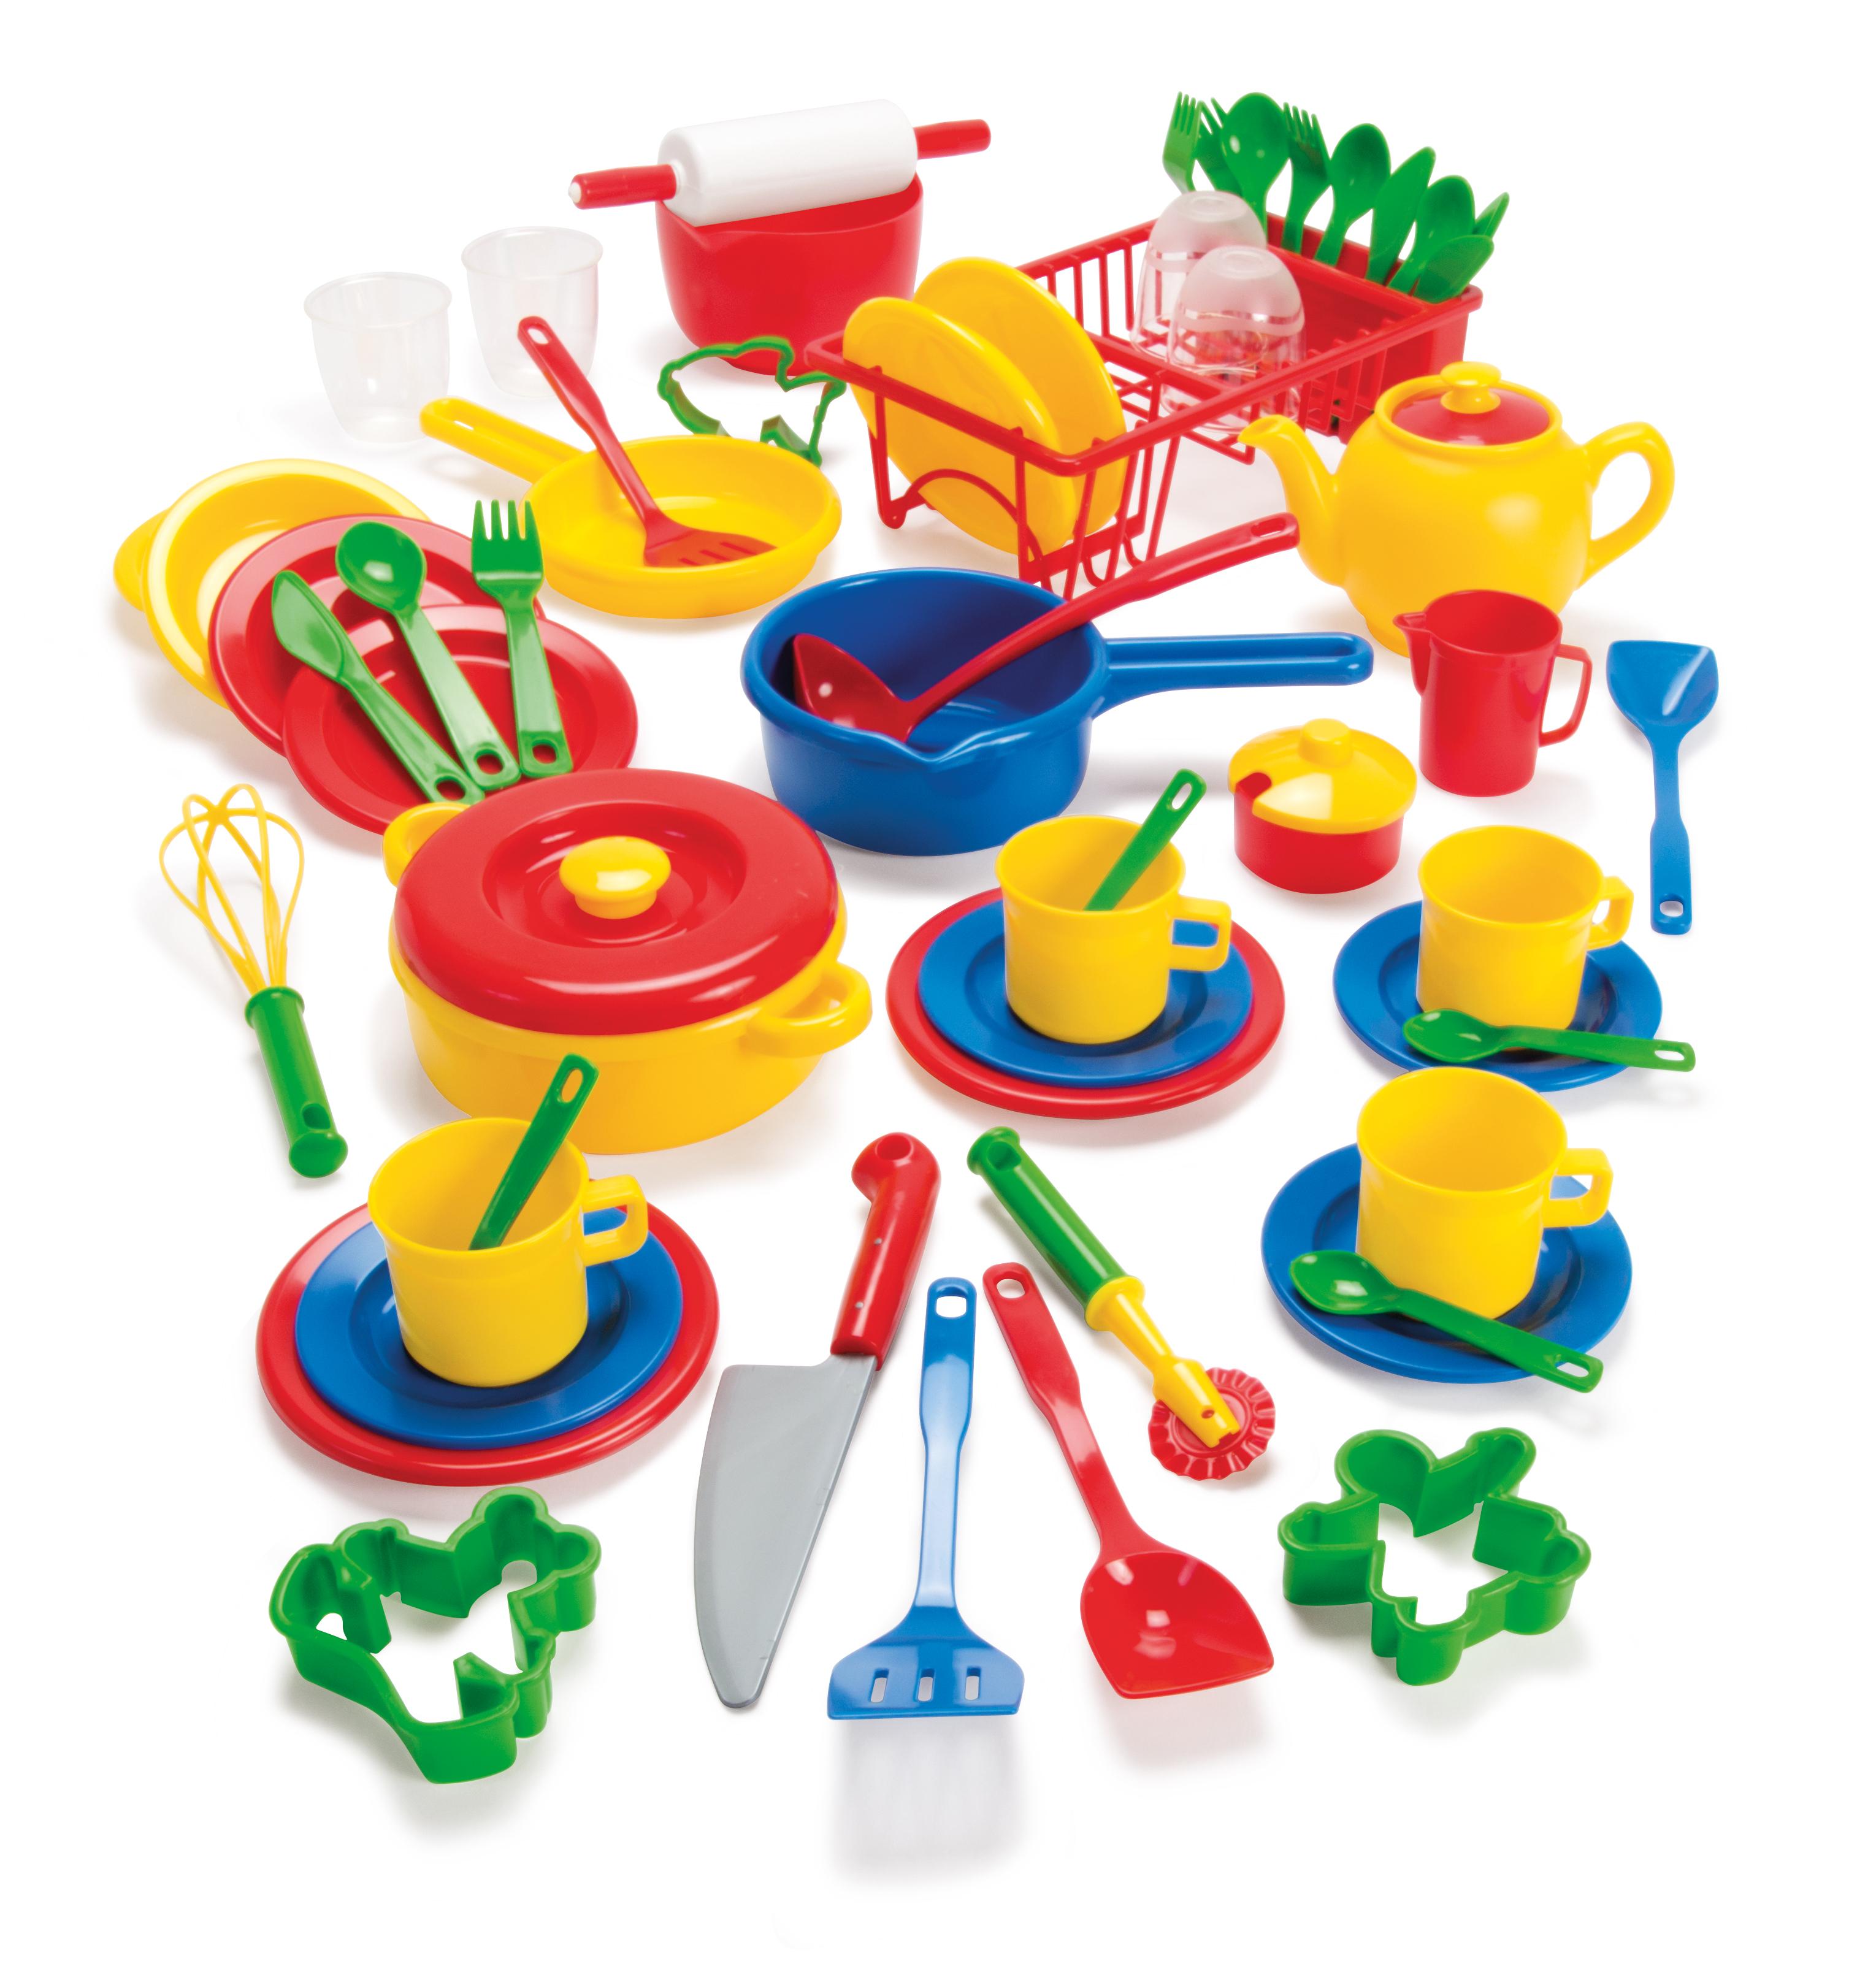 Dantoy - Kitchen Play Set in Box (4256)